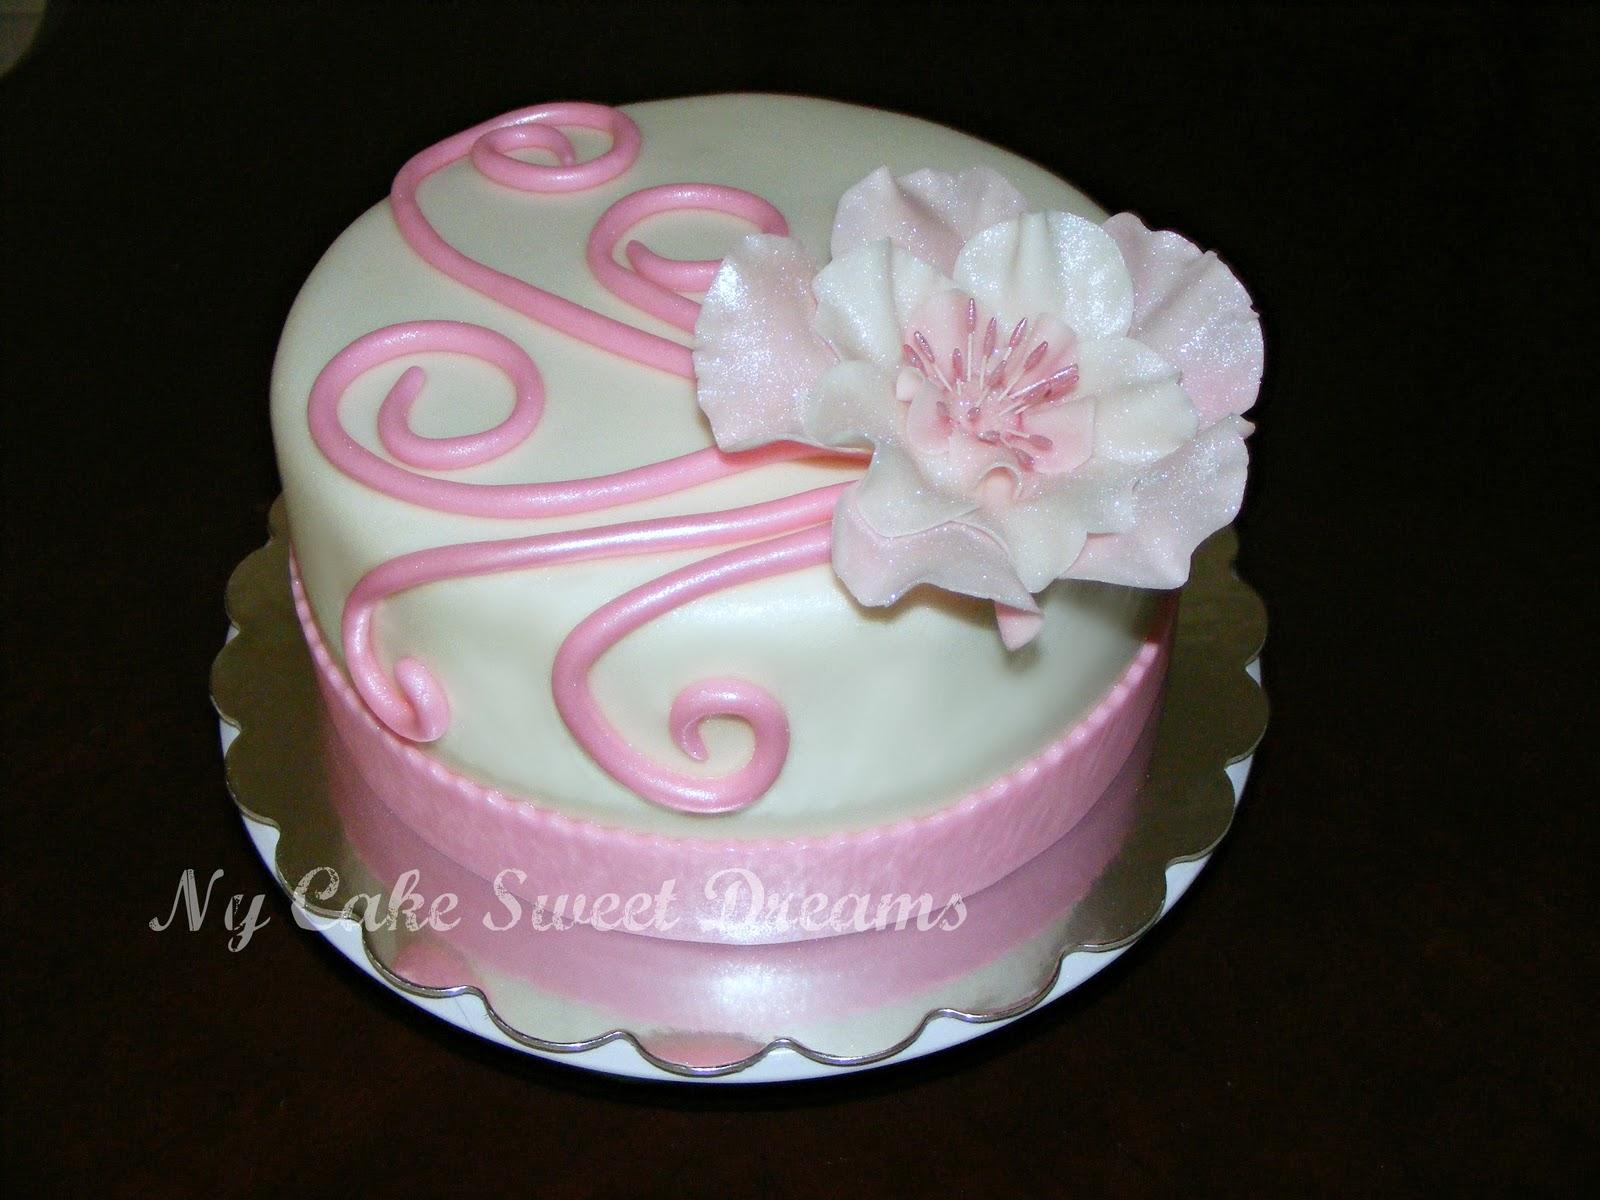 birthday cake recipes mom 1 on birthday cake recipes mom